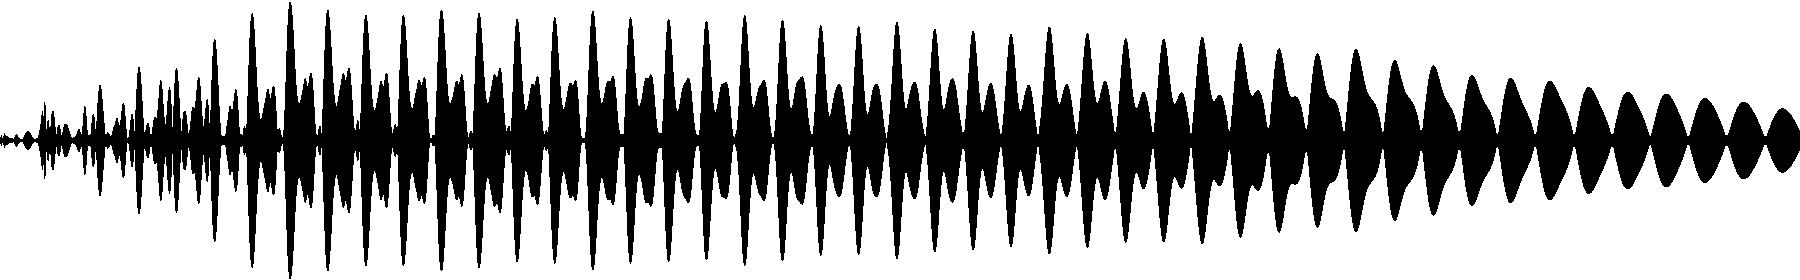 vedh bass cut 049 d